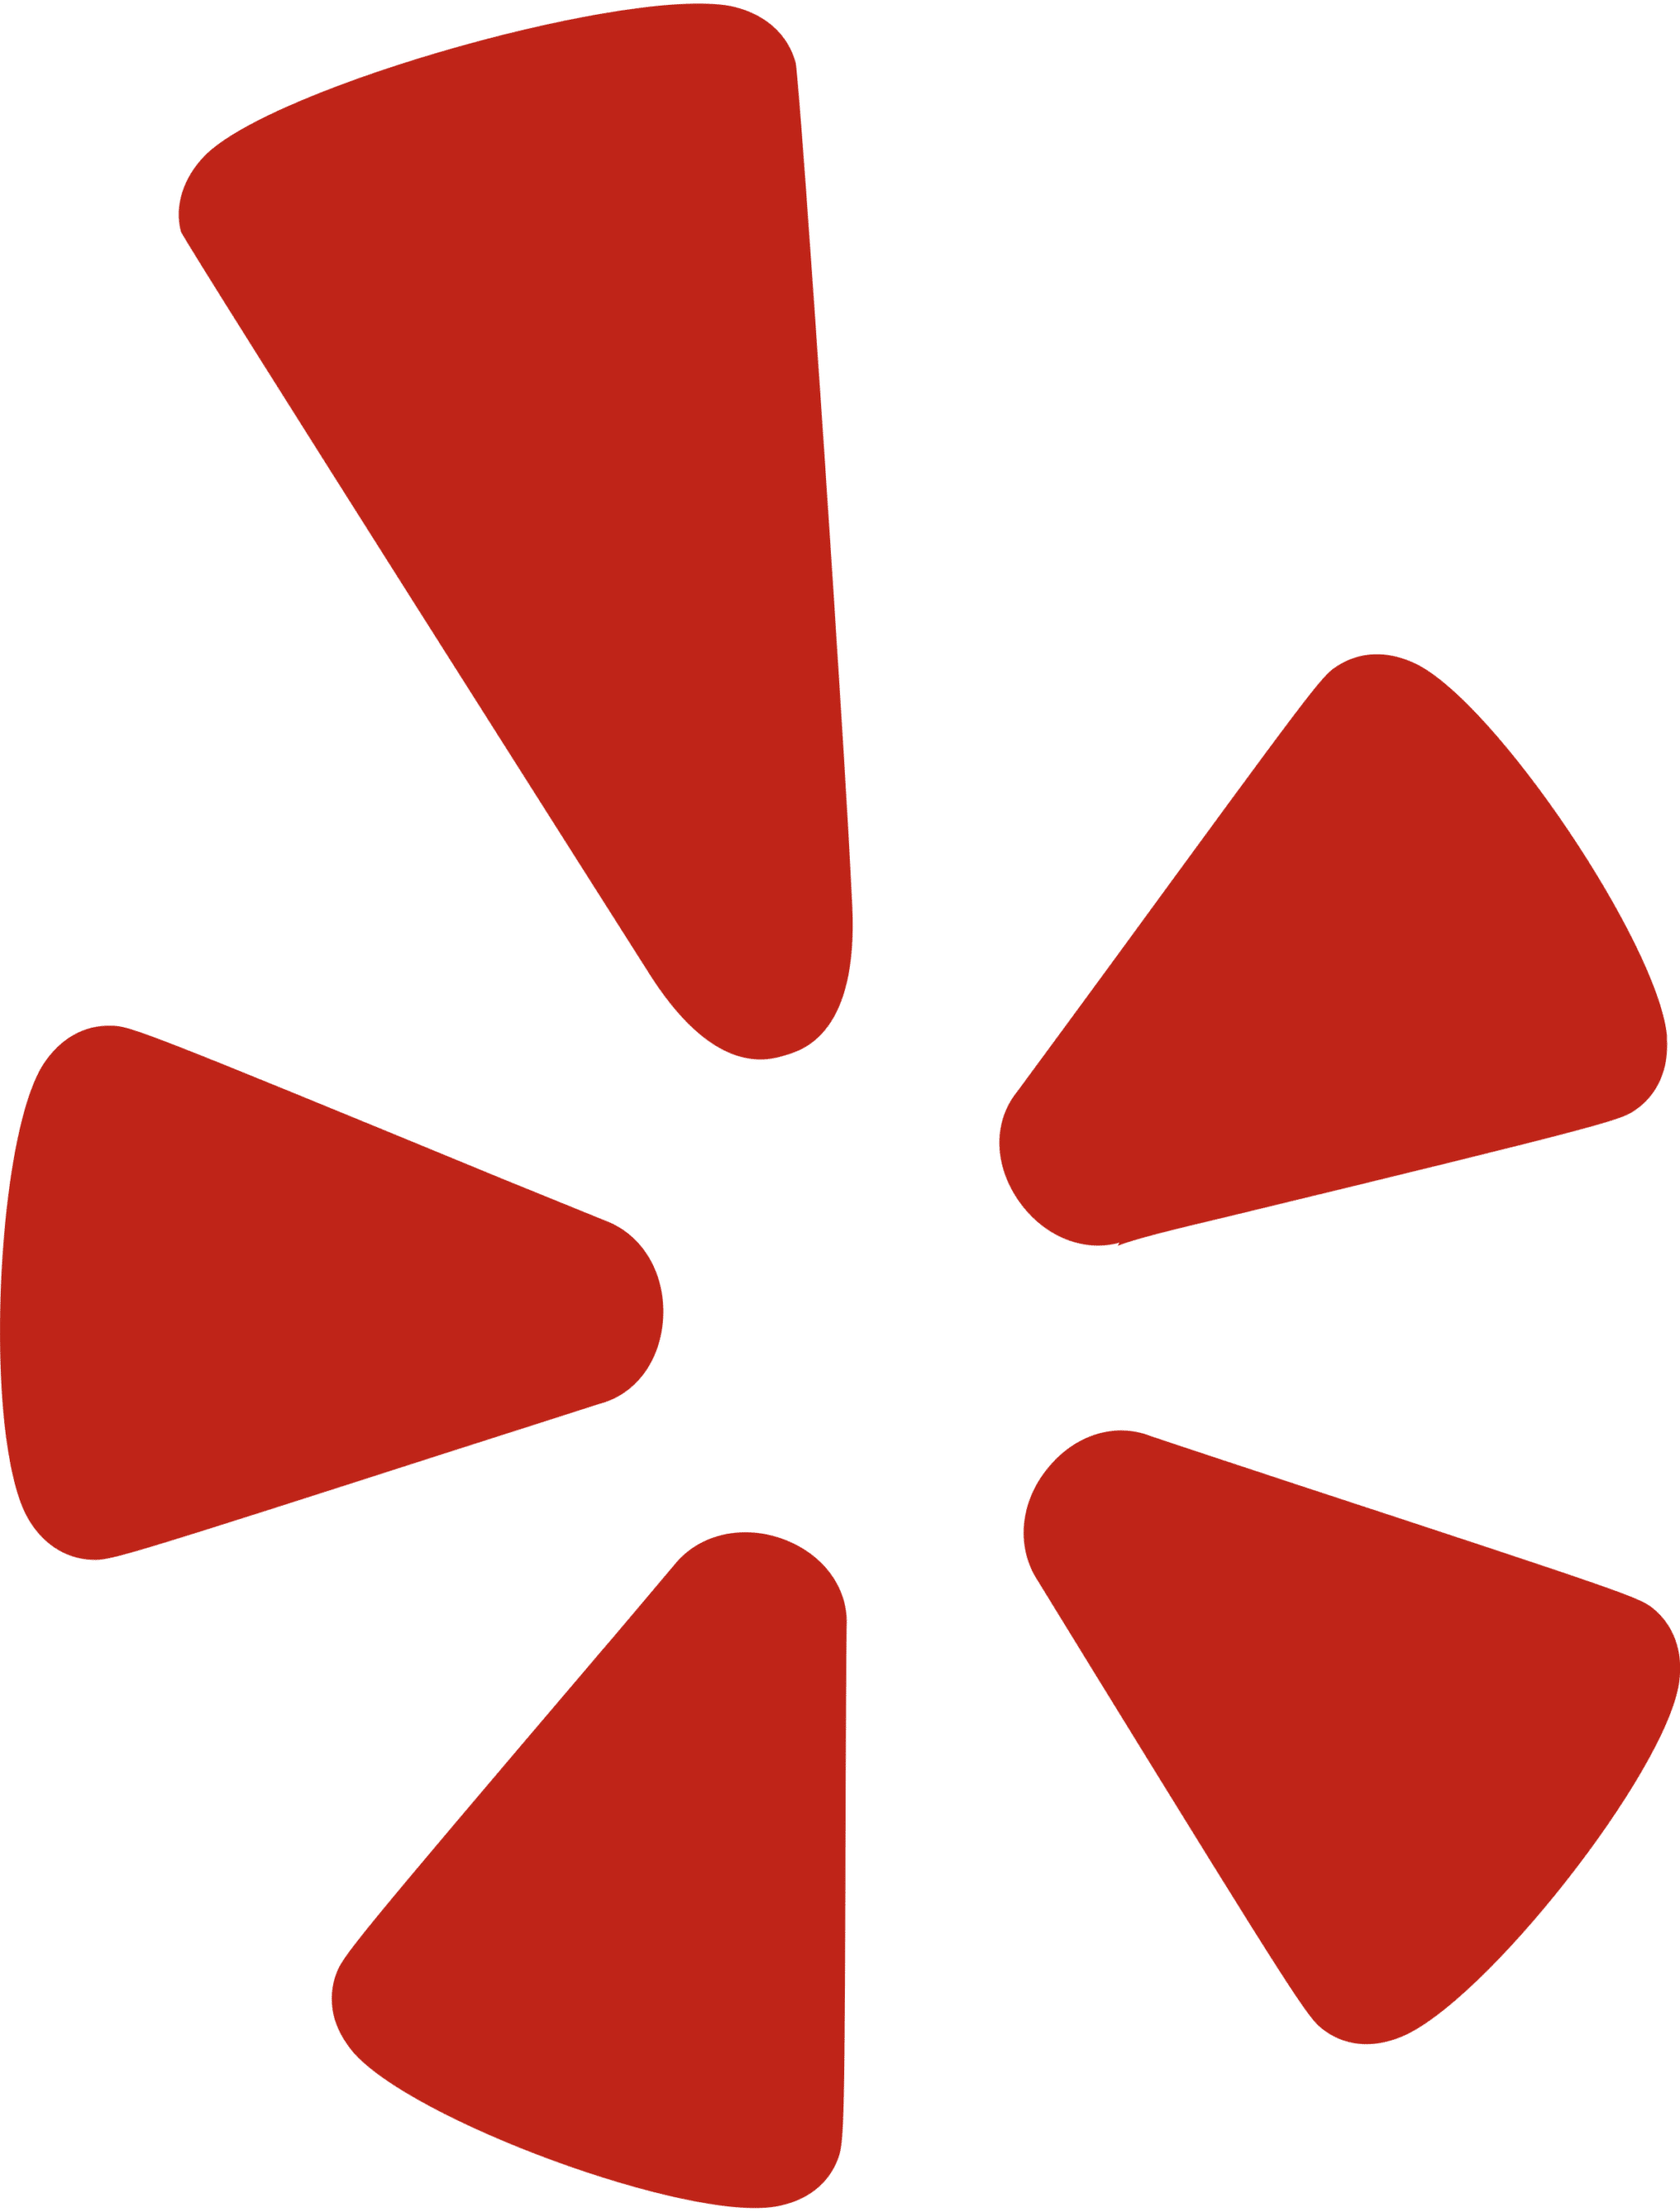 yelp 1 logo png transparent